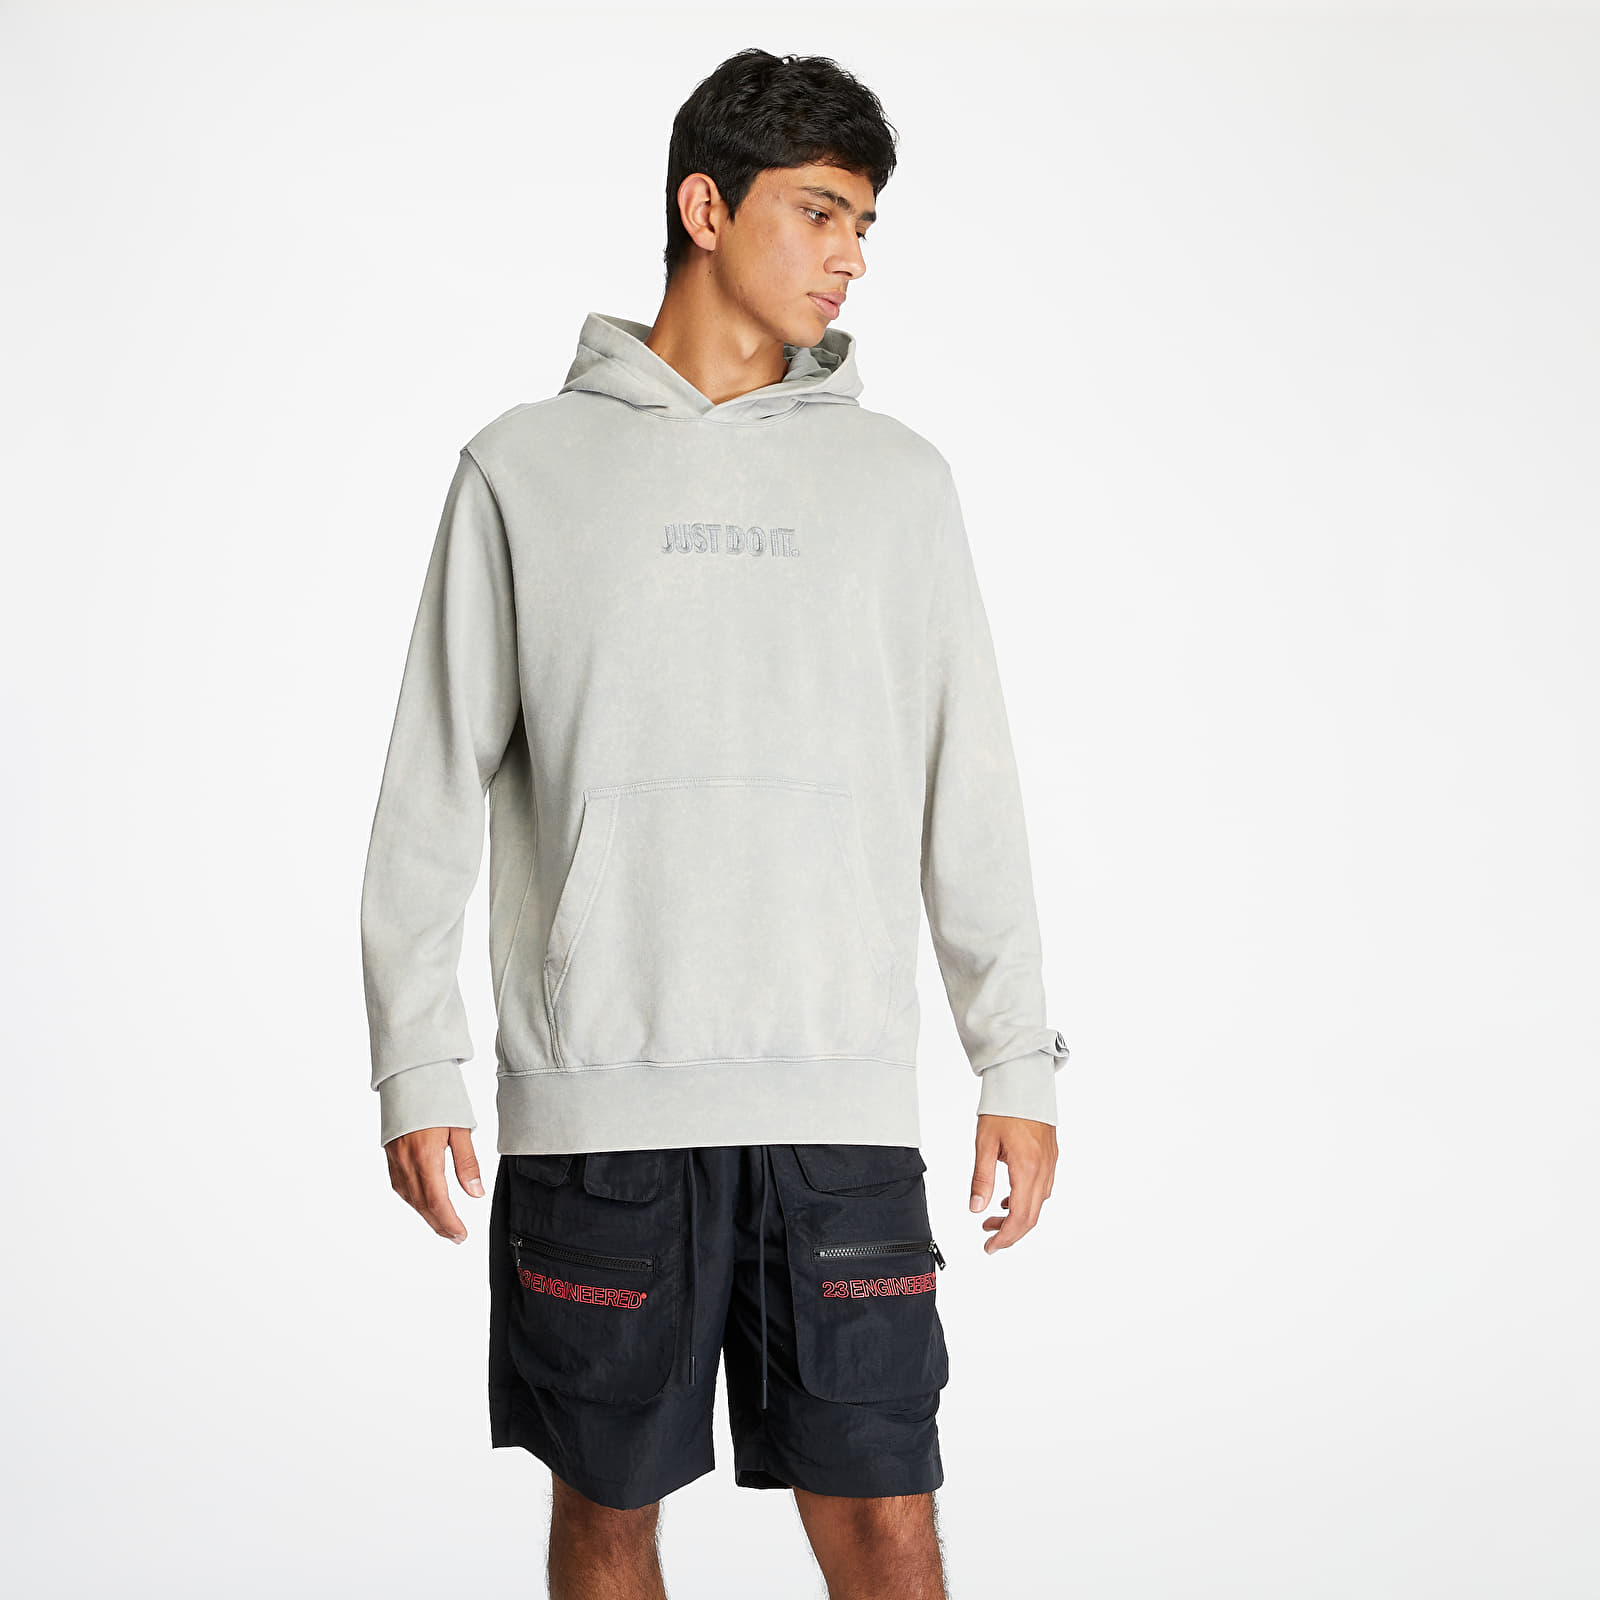 Sweatshirts Nike Sportswear Just Do It Wash Hoodie Lt Smoke Grey/ Lt Smoke Grey